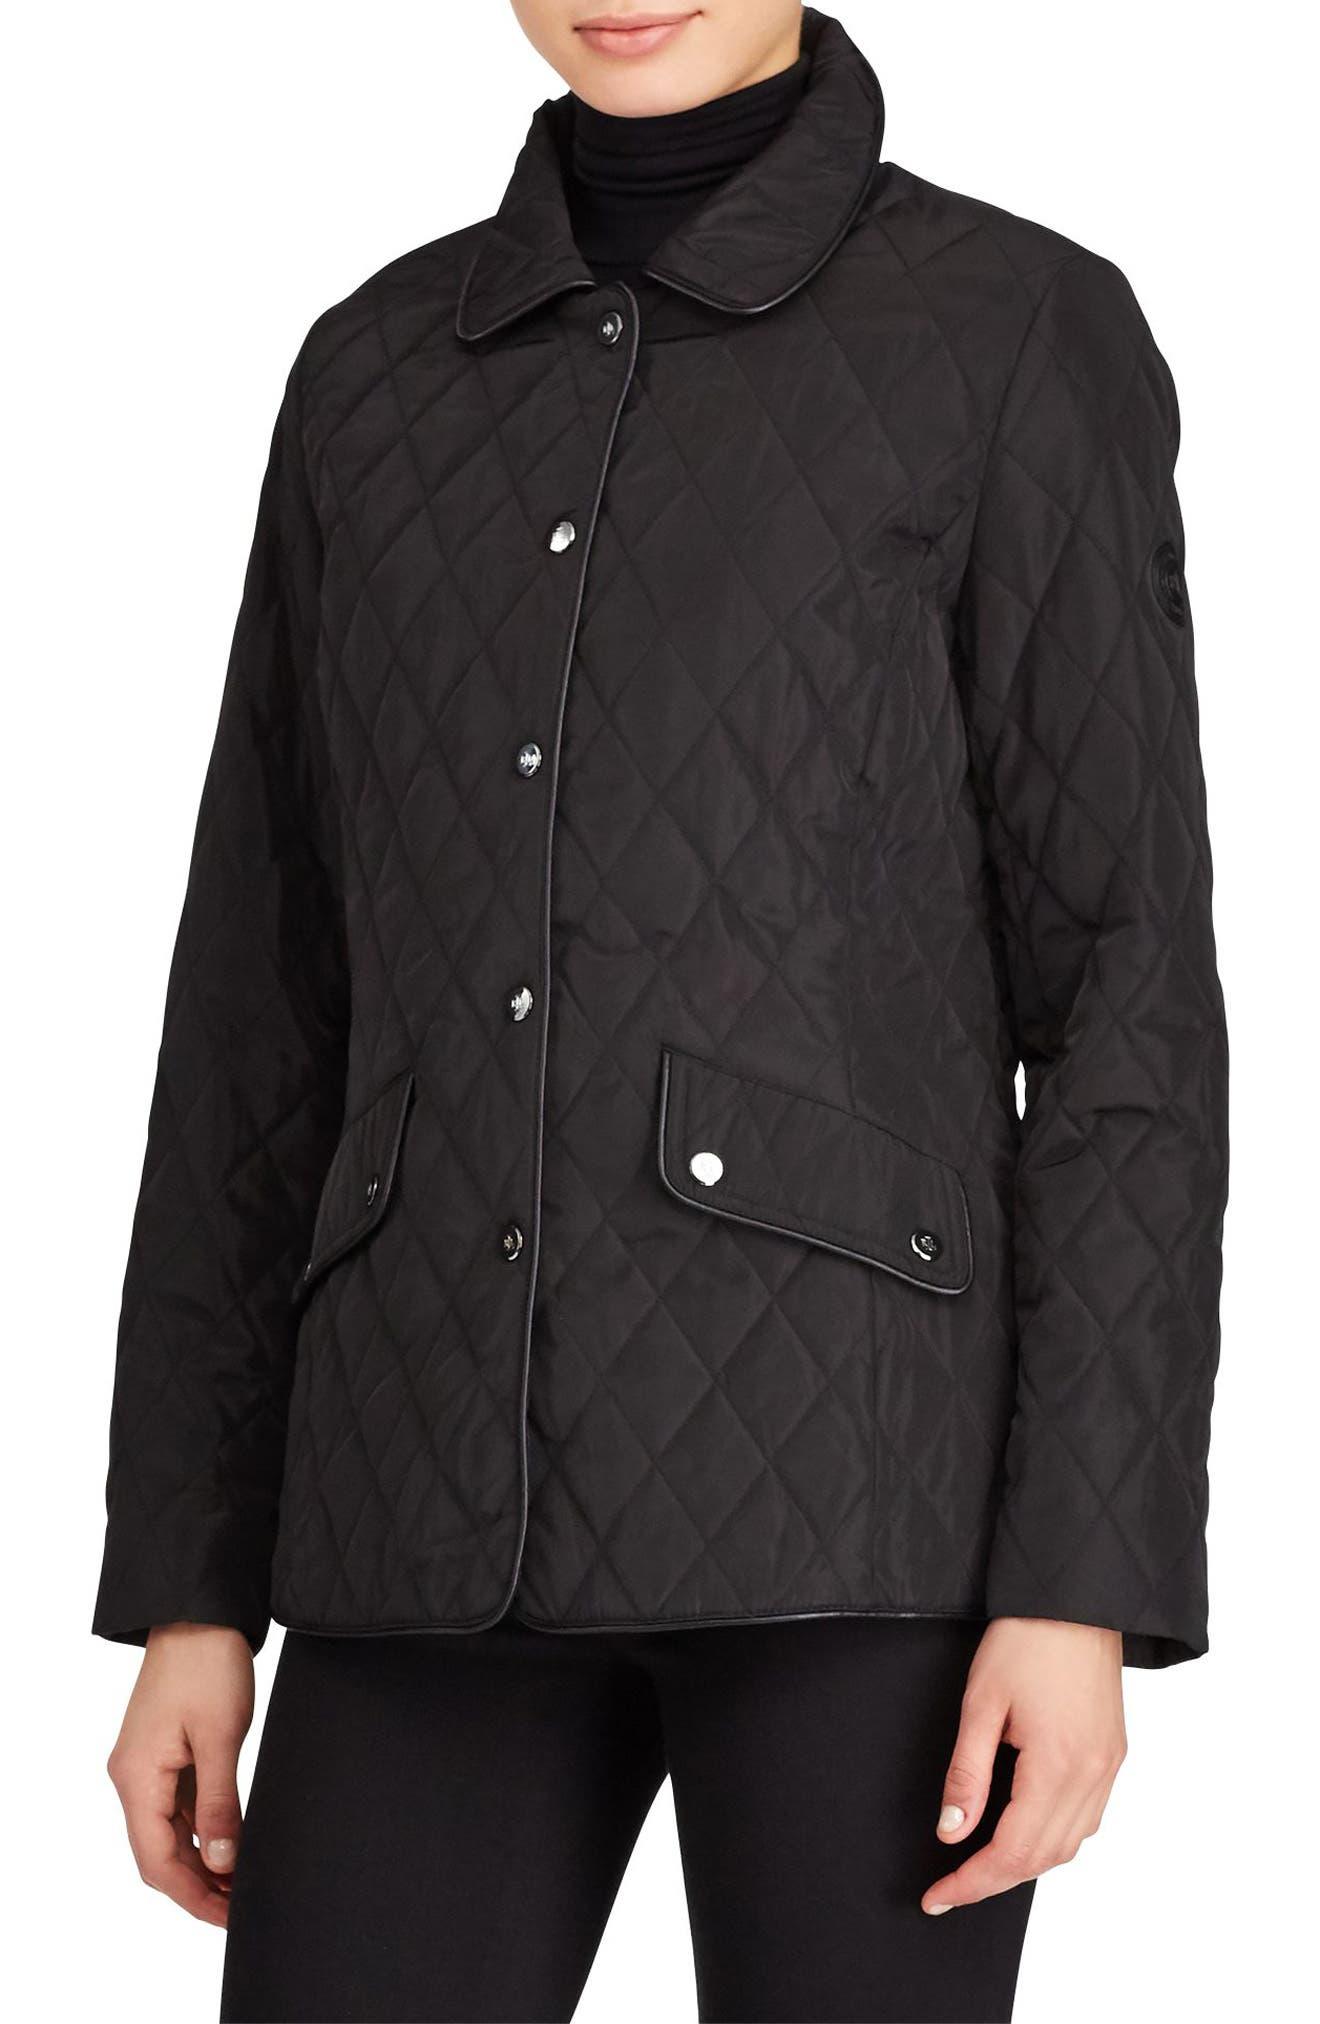 Alternate Image 1 Selected - Lauren Ralph Lauren Faux Leather Trim Quilted Jacket (Regular & Petite)